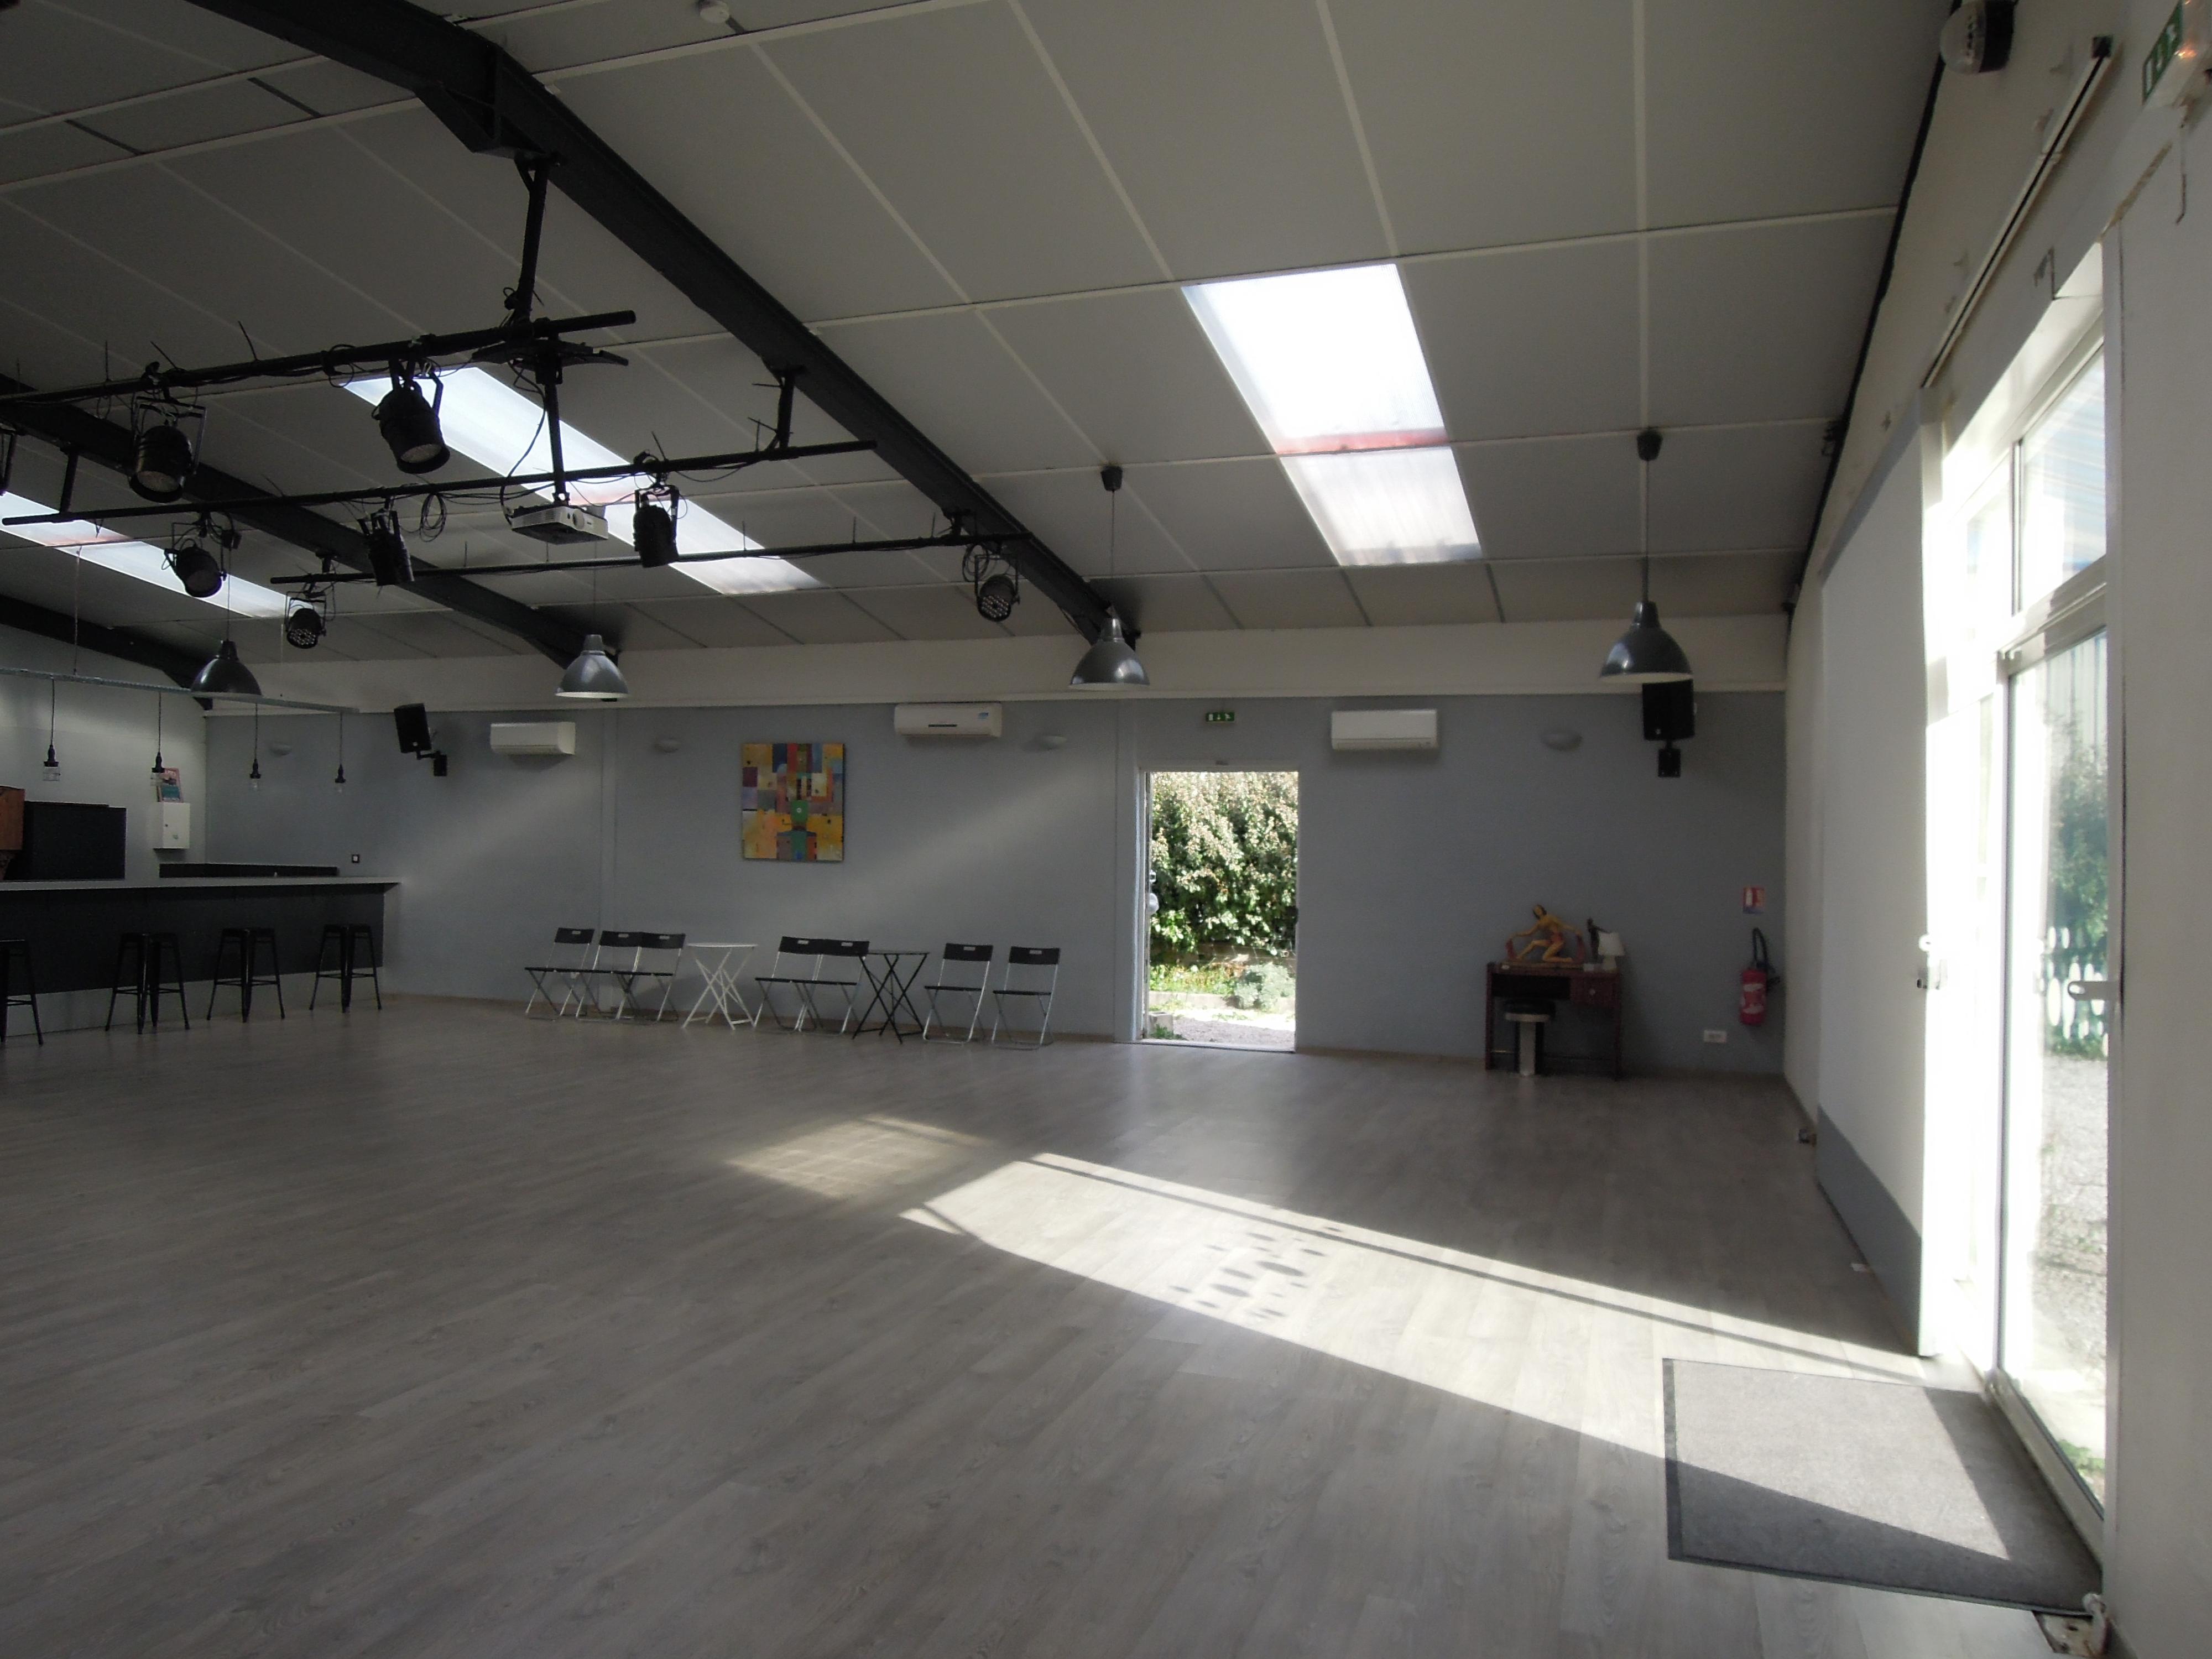 Dscn6005 el sal n de tango rufino luro cambaceres location salle de danse montpellier - Danse de salon montpellier ...